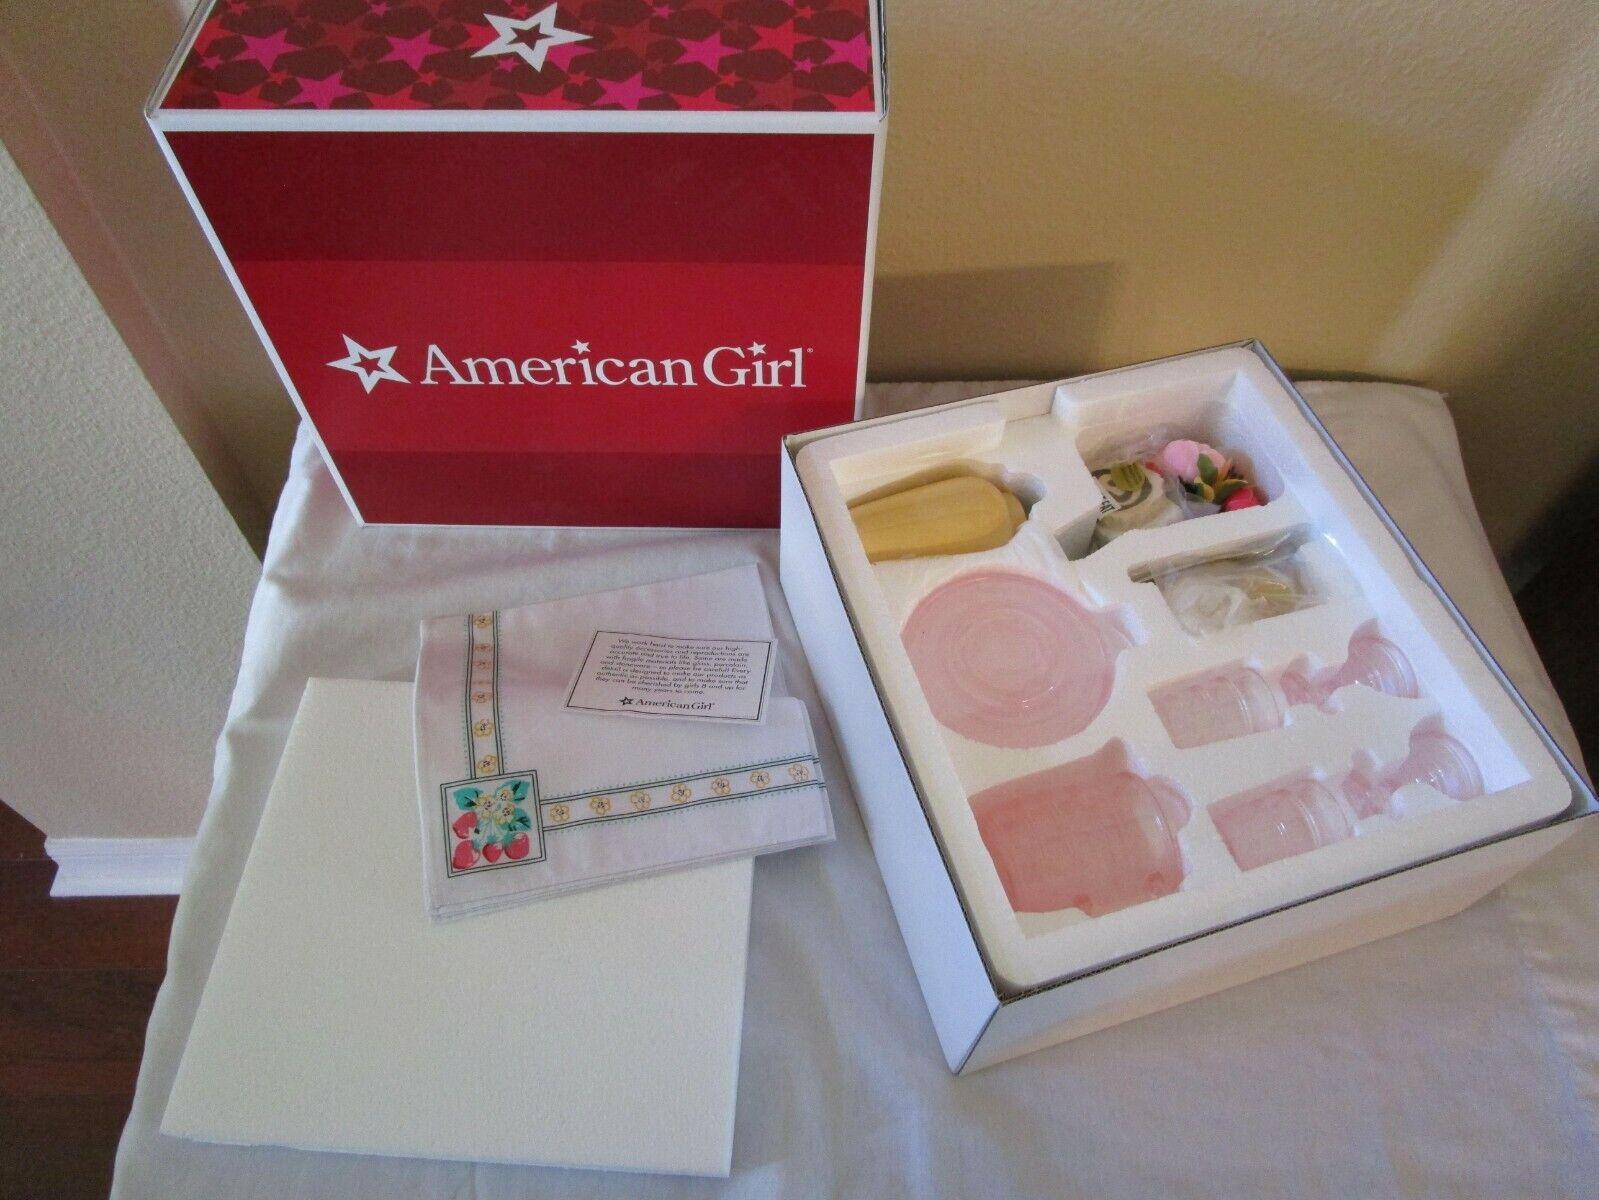 AMERICAN GIRL Kit's Birthday Set Glassware and Linens BRAND NEW